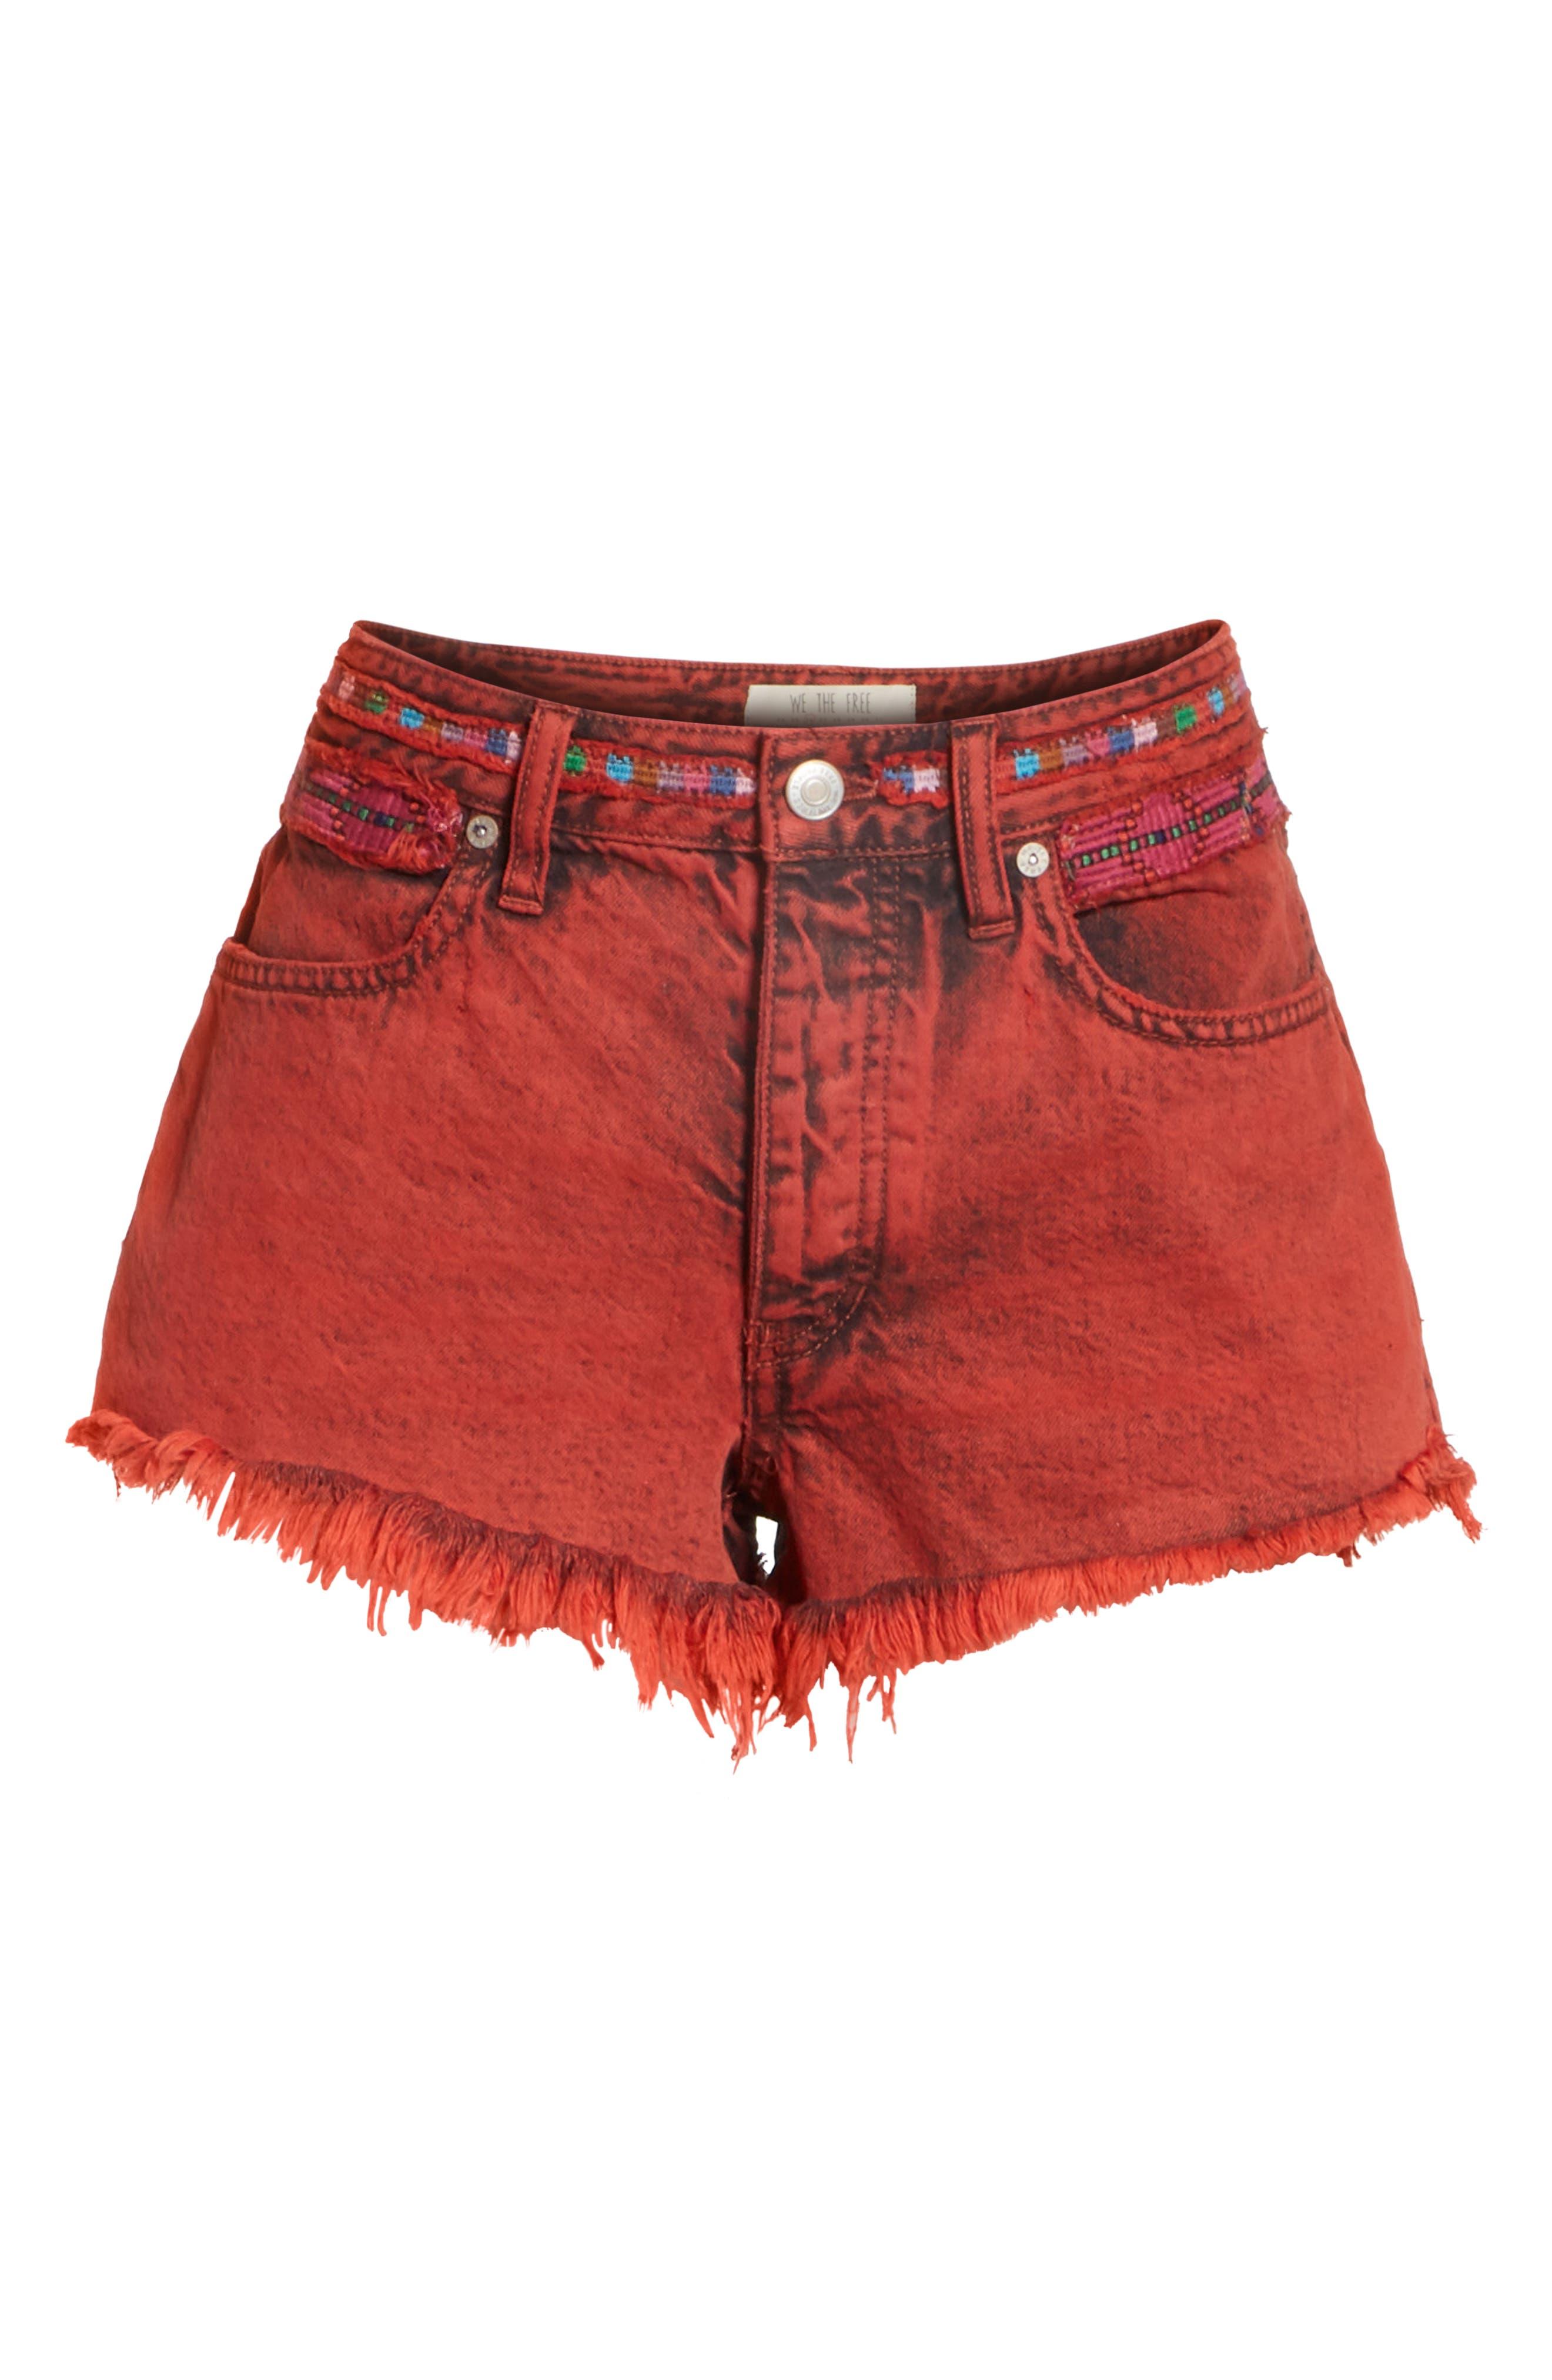 Sun Break Embellished Cutoff Shorts,                             Alternate thumbnail 6, color,                             Red